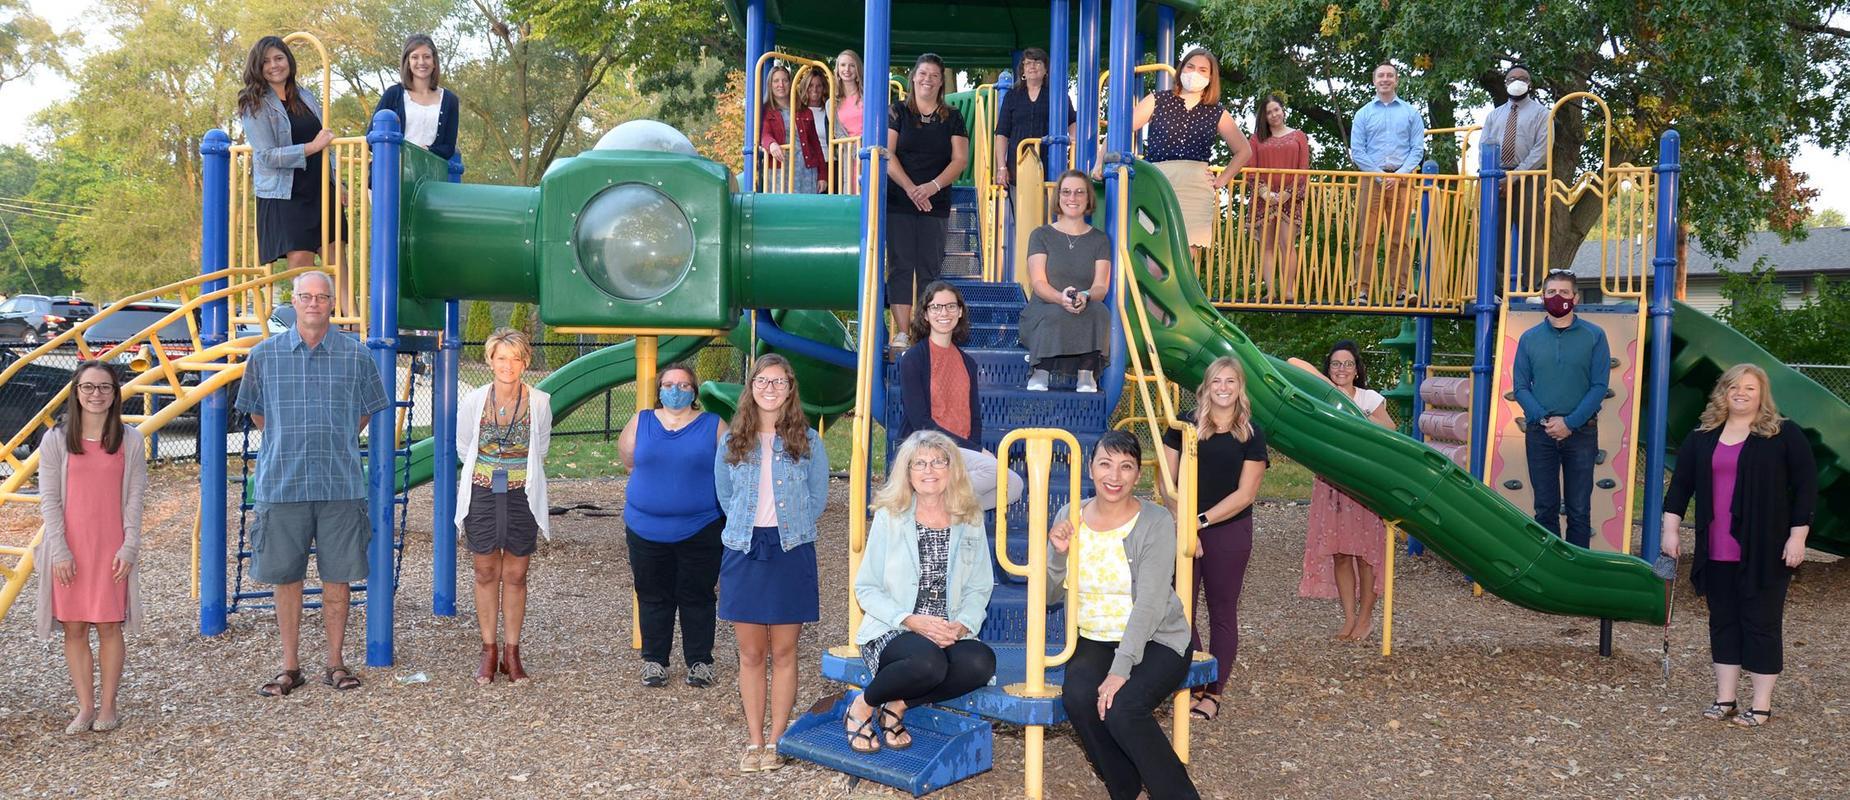 photo of staff standing on playground equipment 6 feet apart